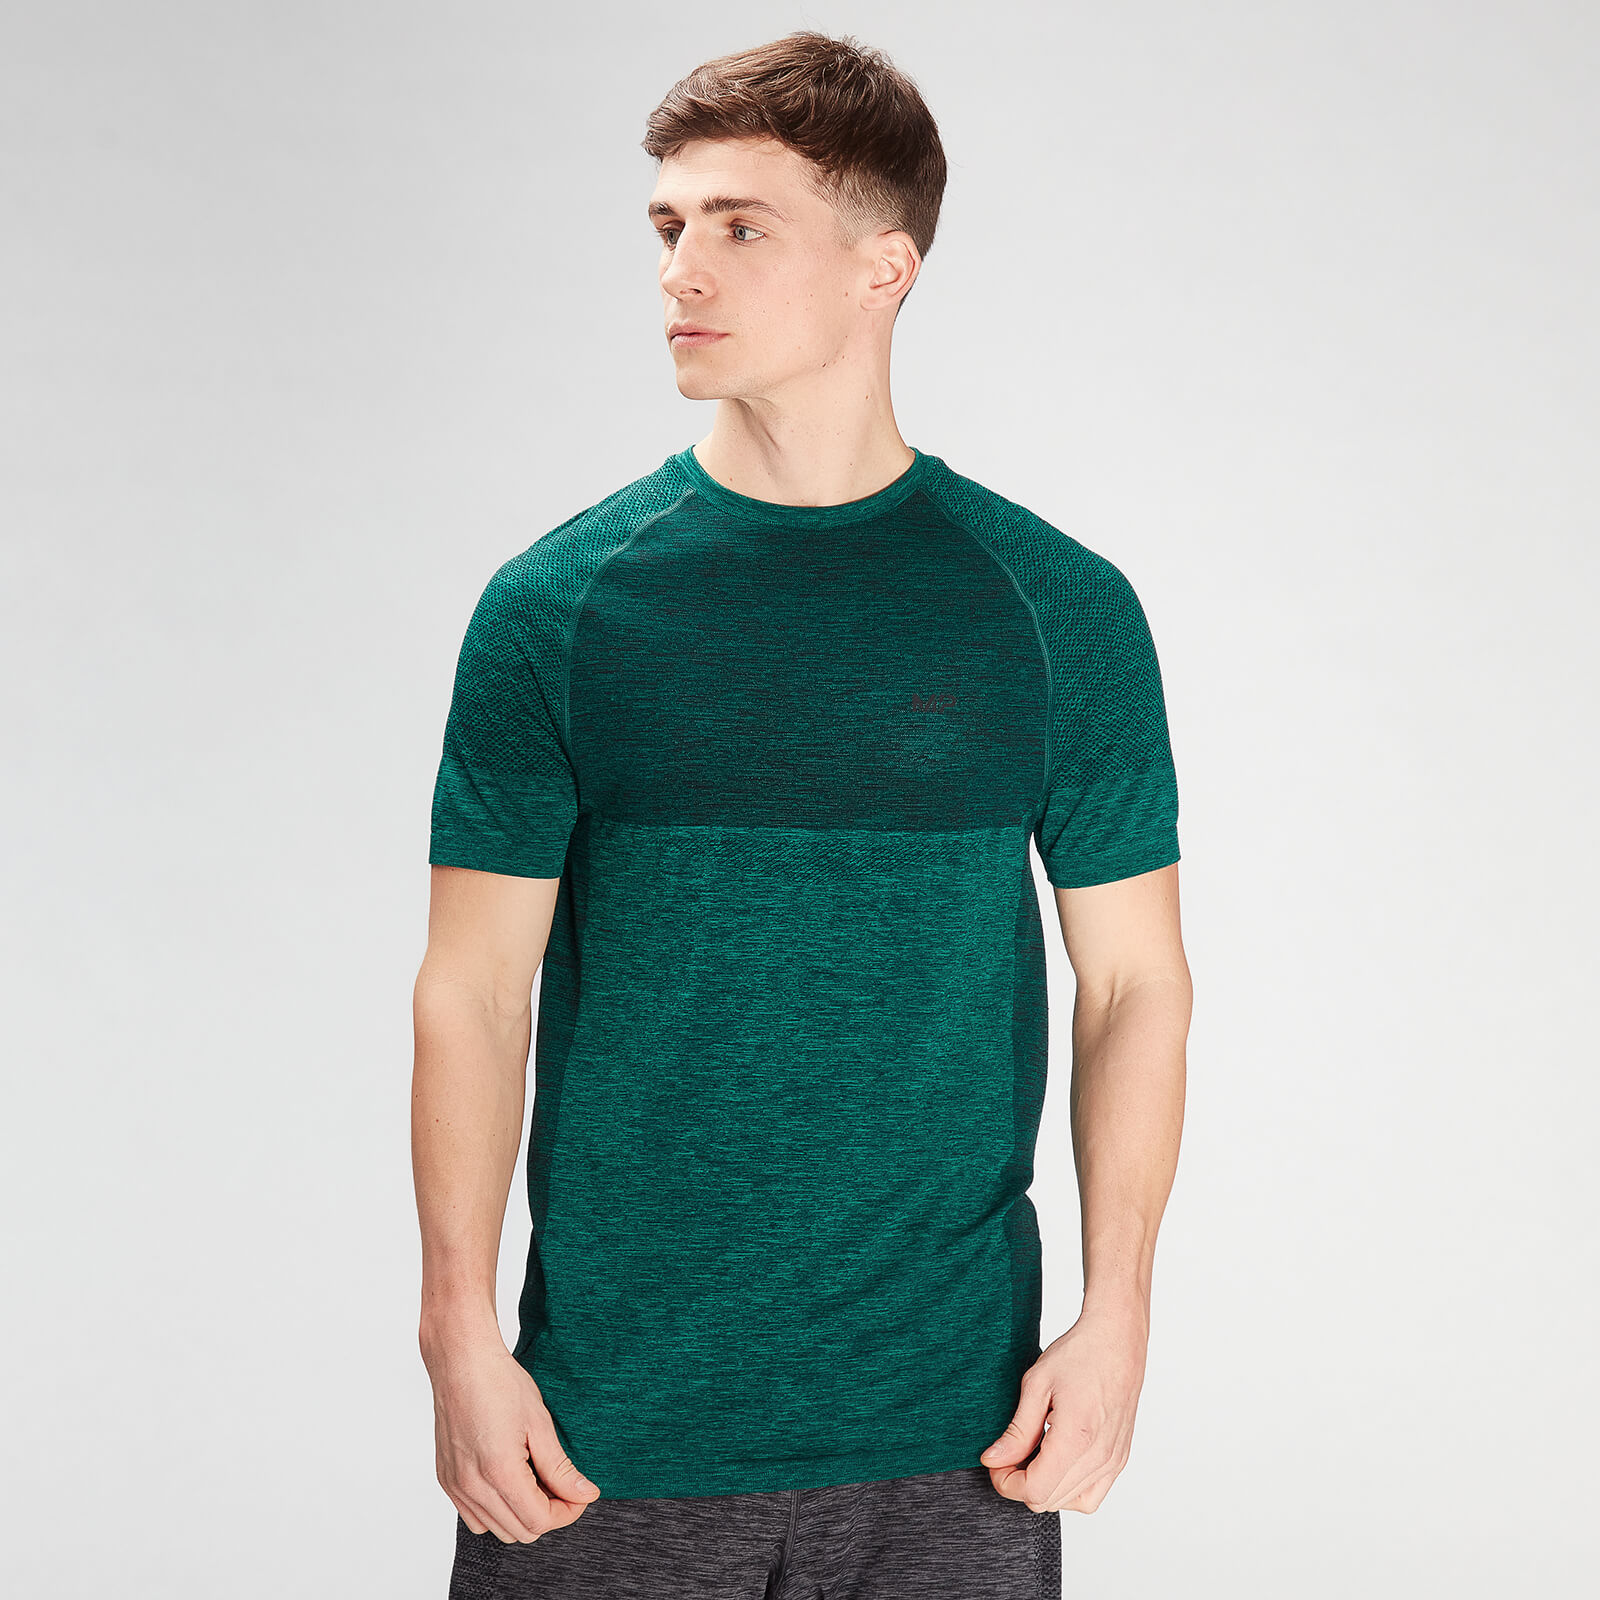 Купить MP Men's Essential Seamless Short Sleeve T-Shirt- Energy Green Marl - XXL, Myprotein International